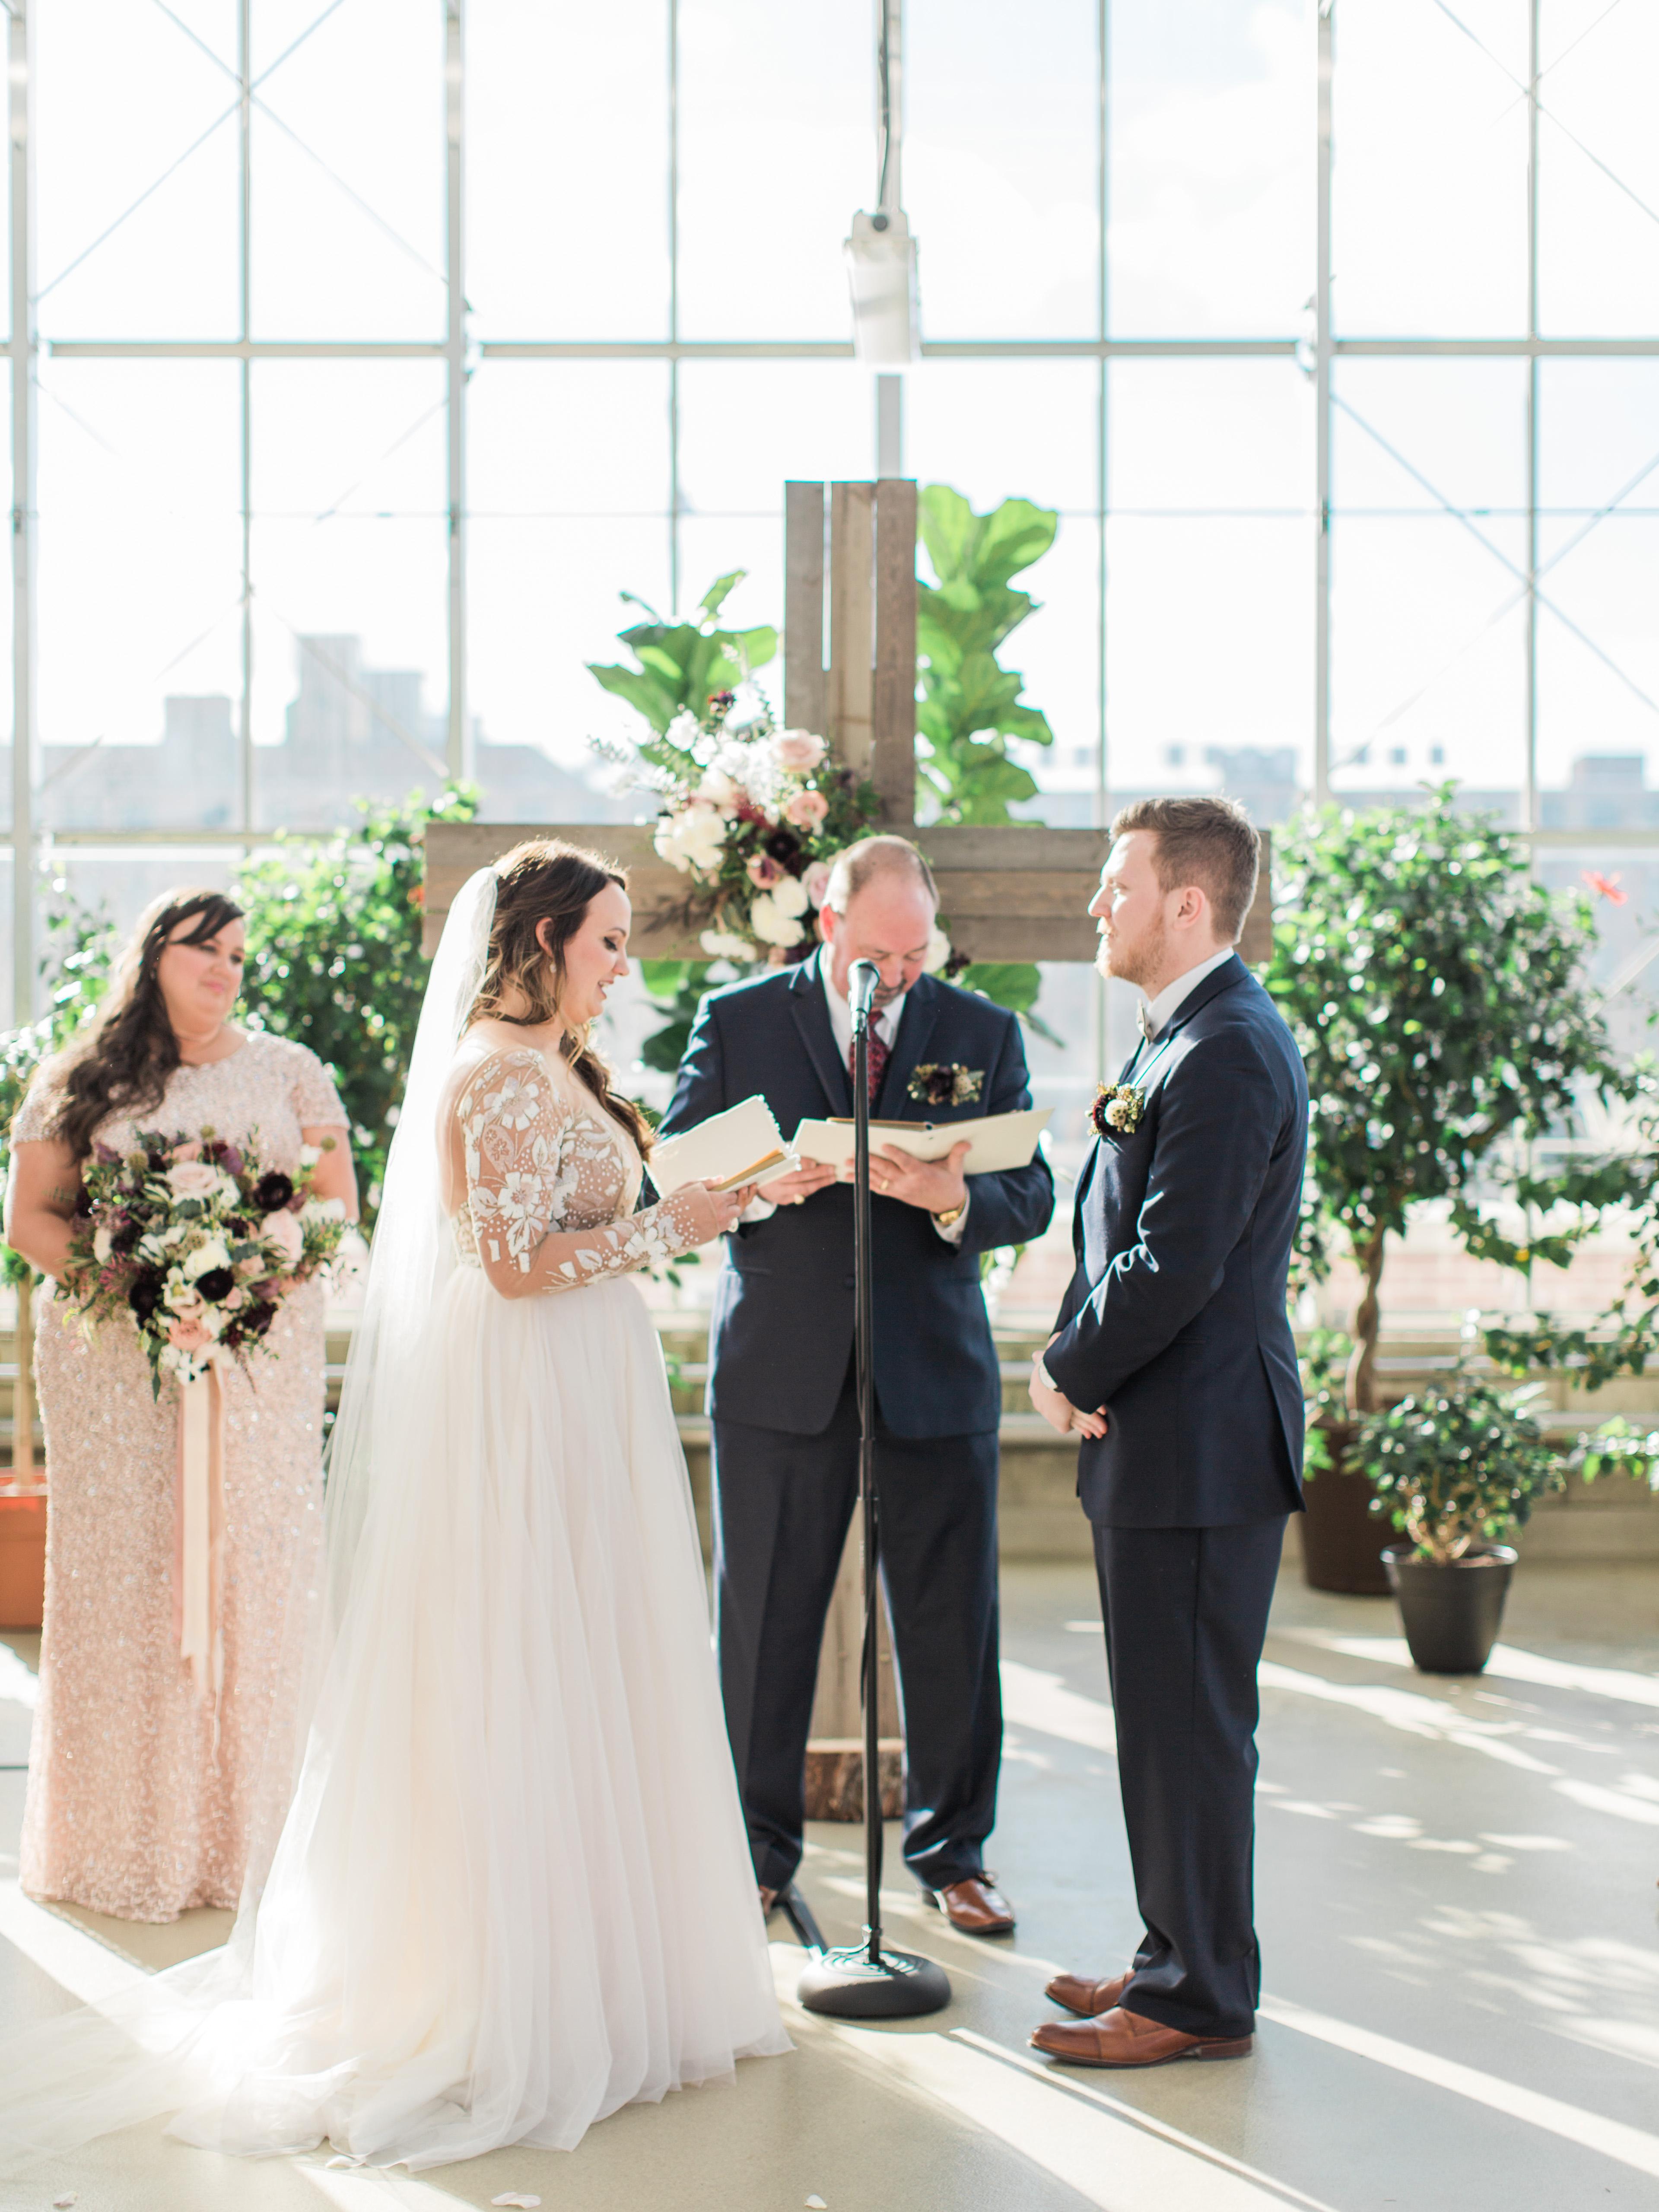 chatterton williams wedding, wedding vows